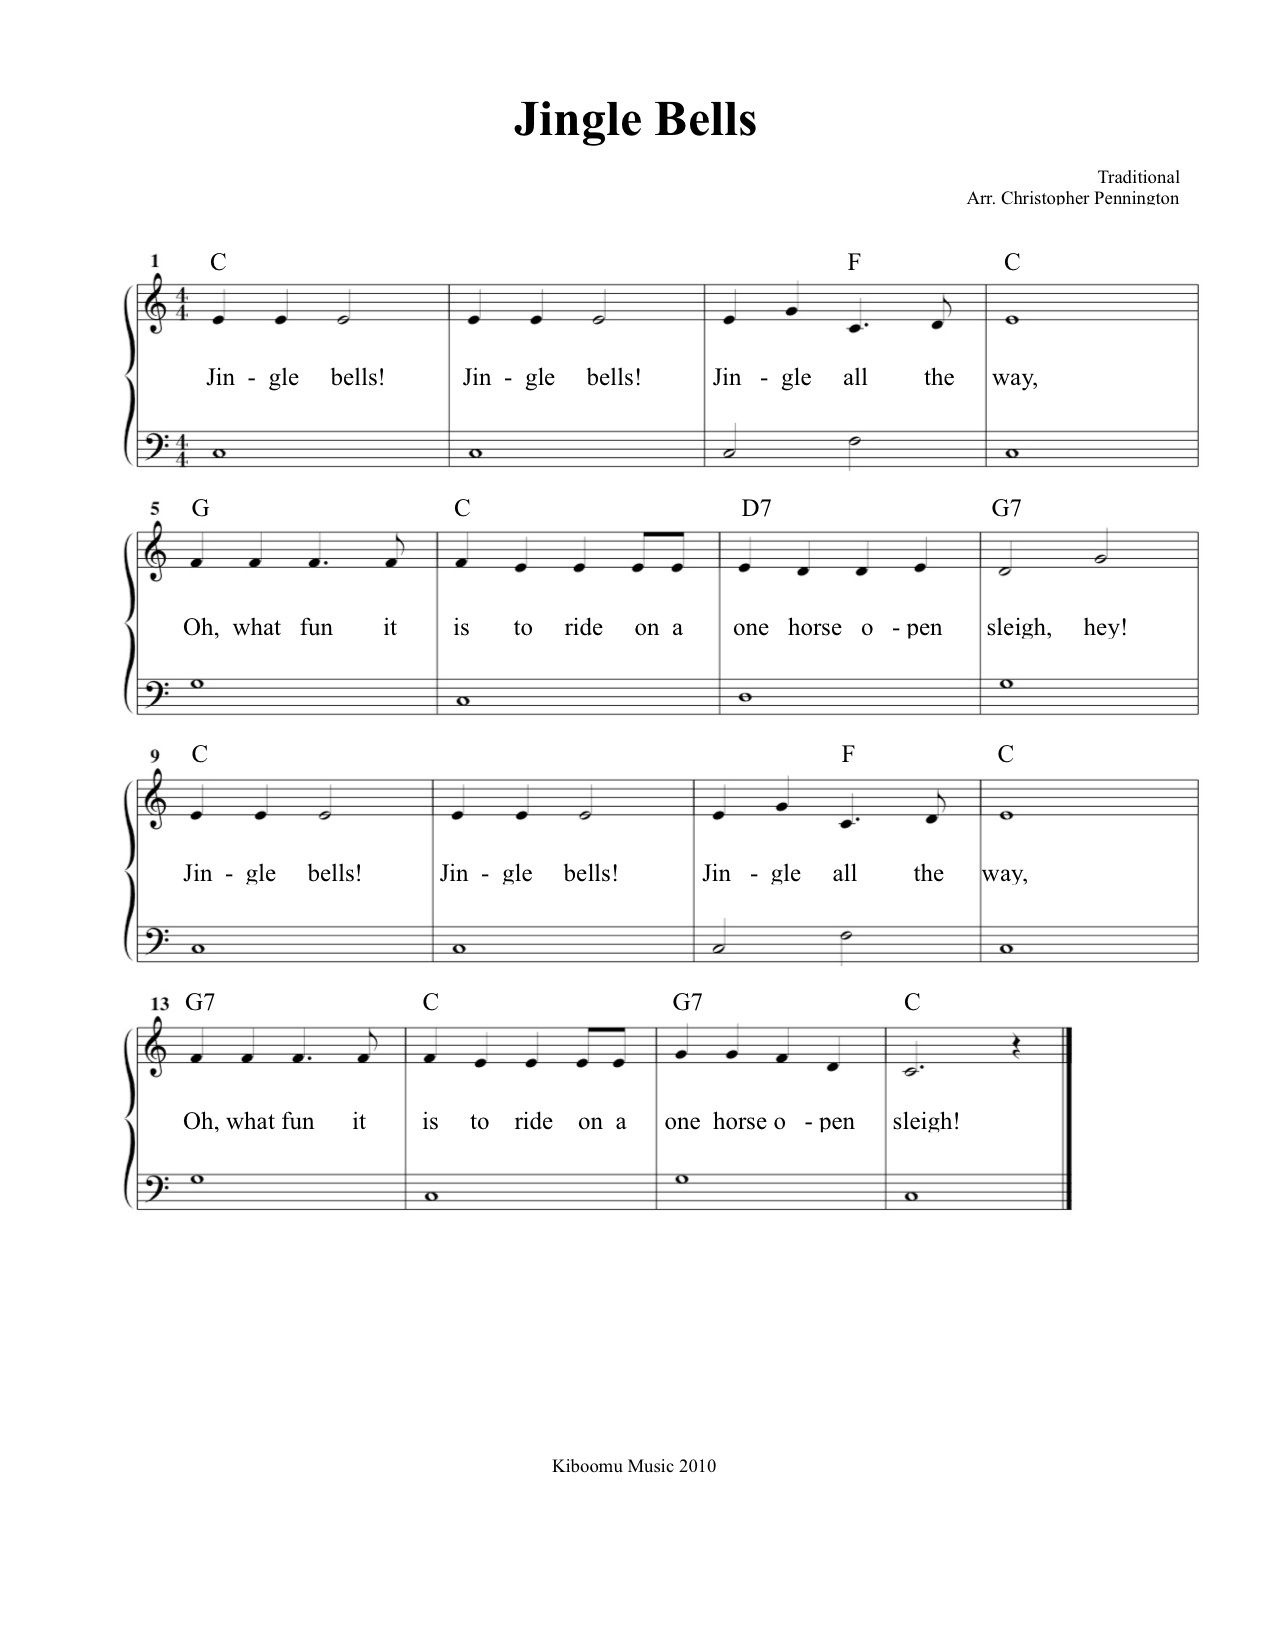 Free Printable Jingle Bells Sheet Music And Song For Kids! | Piano - Christmas Songs Piano Sheet Music Free Printable